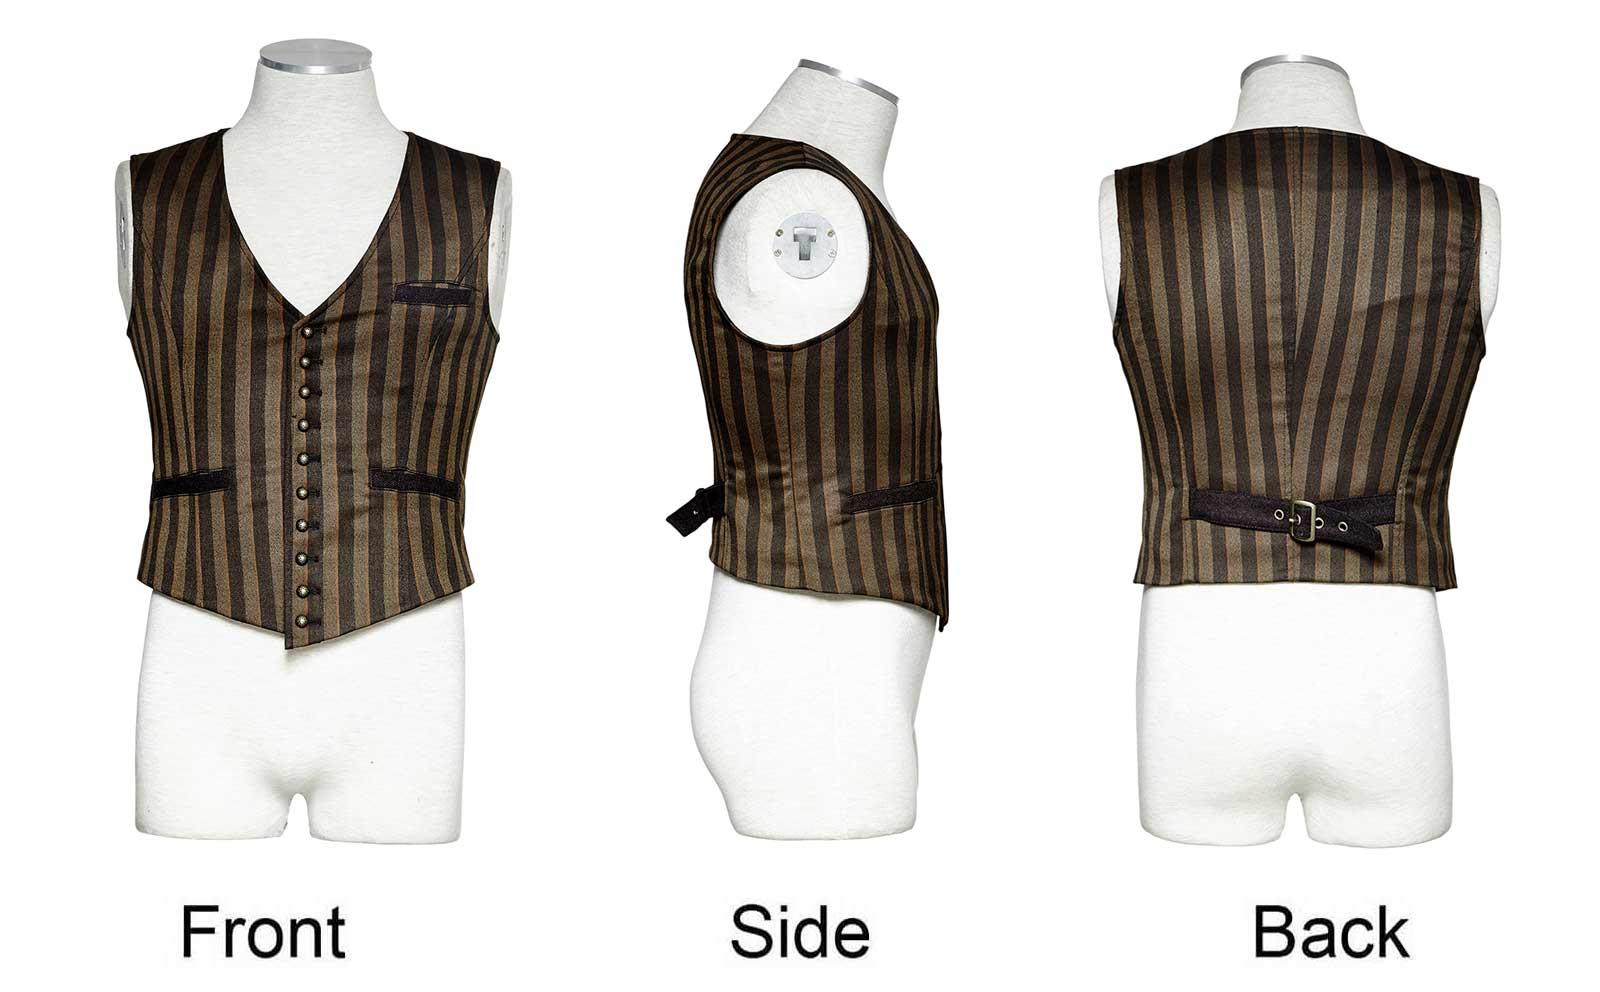 f8dbe5b4c44b2 ... Detail image to PUNK RAVE Gentleman Waistcoat Striped ...